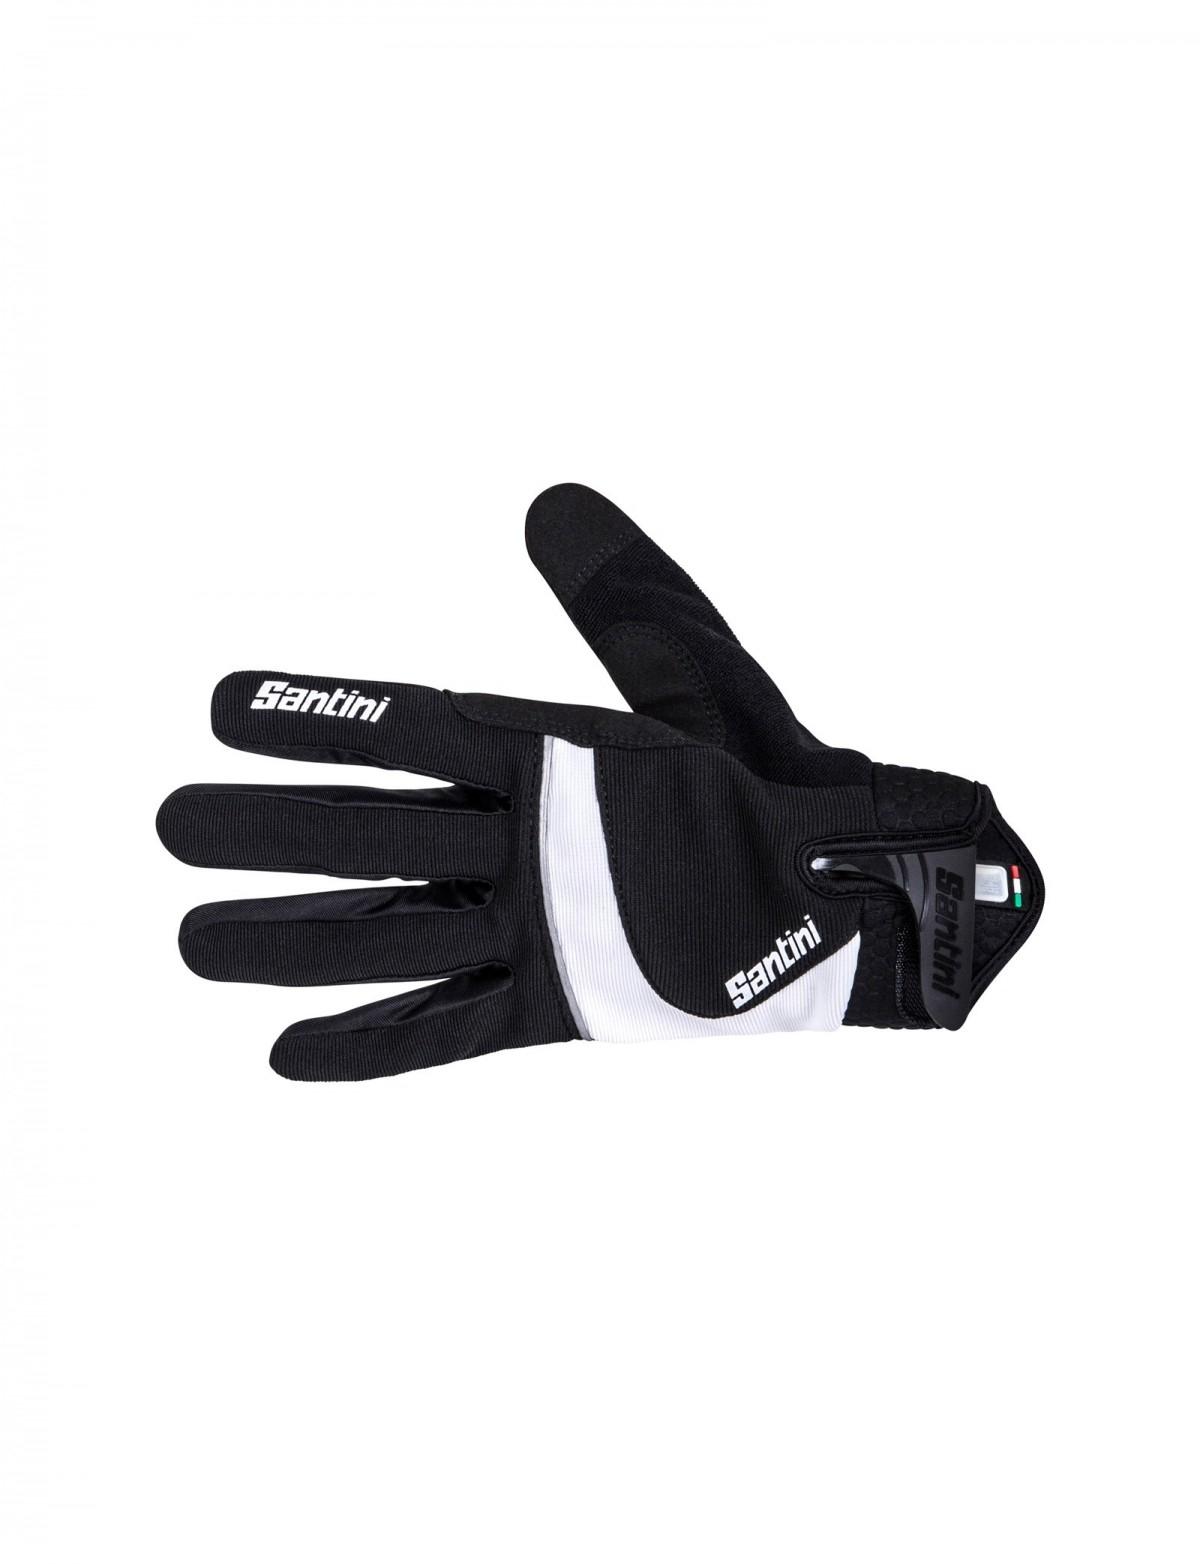 Santini Studio Mid χειμερινά γάντια - Δαλαβίκας bikes 06c0b36cb6e